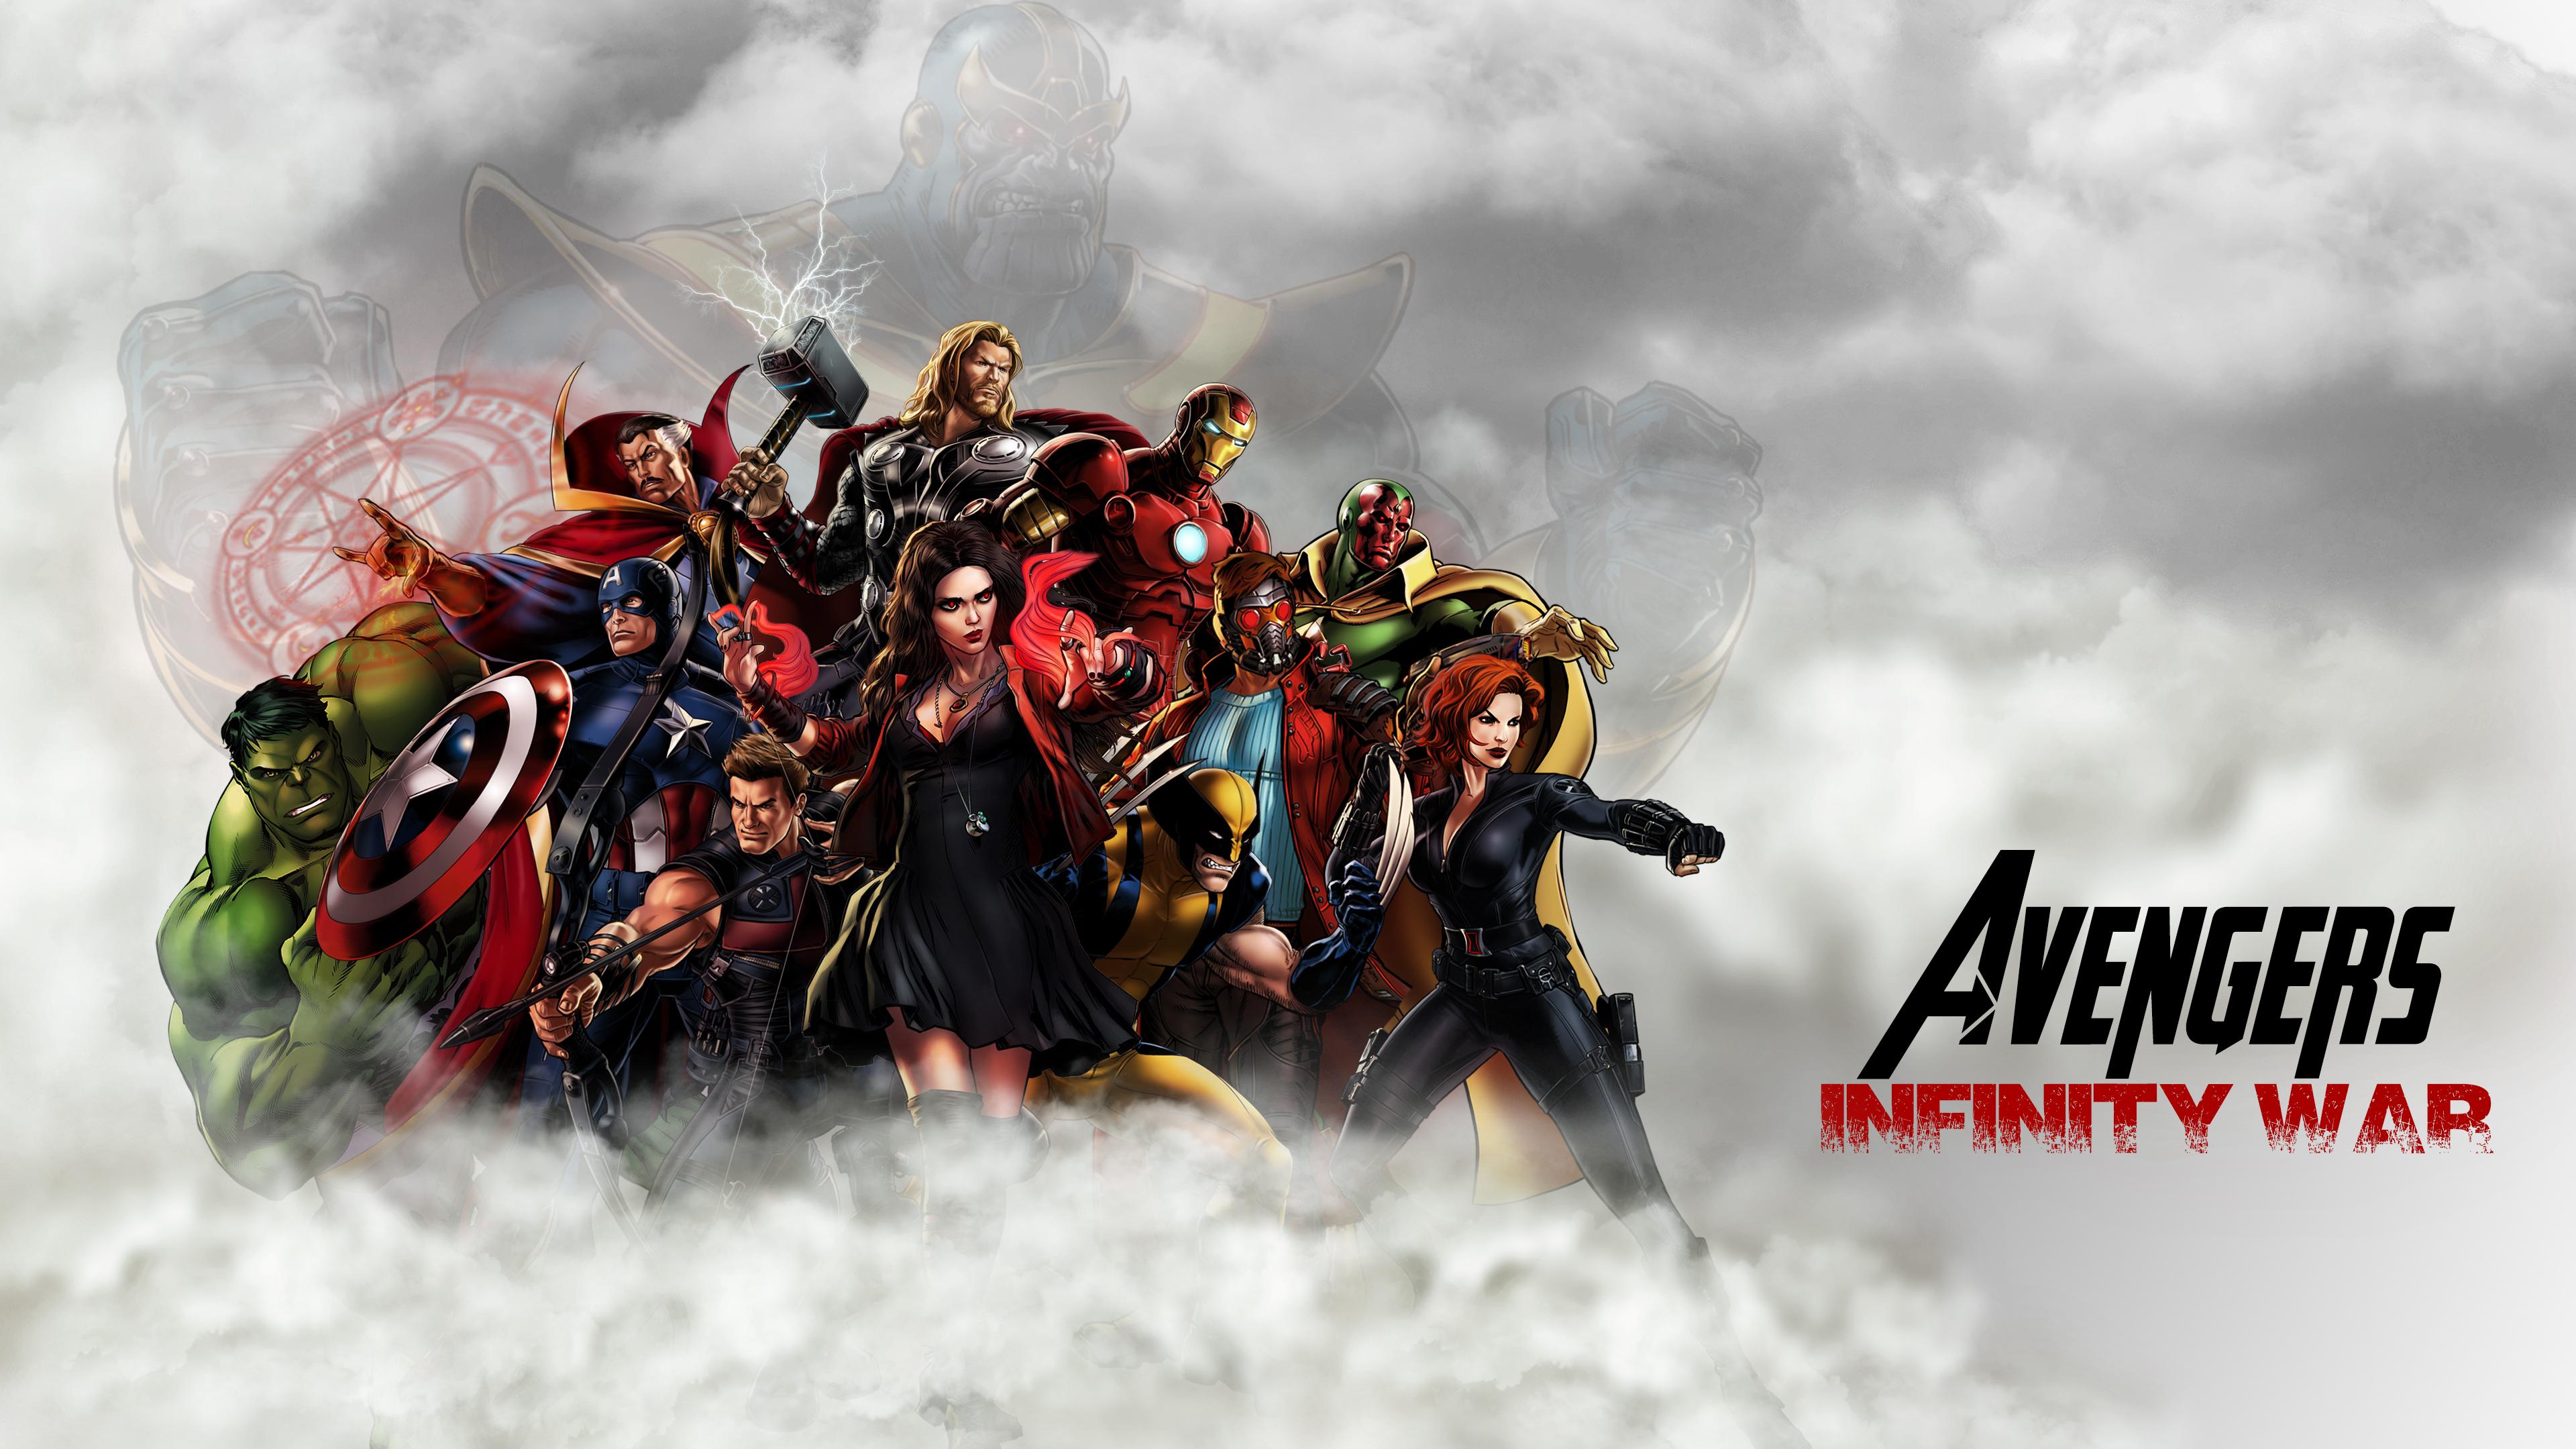 avengers infinity war 2018 artwork 4k hd movies 4k